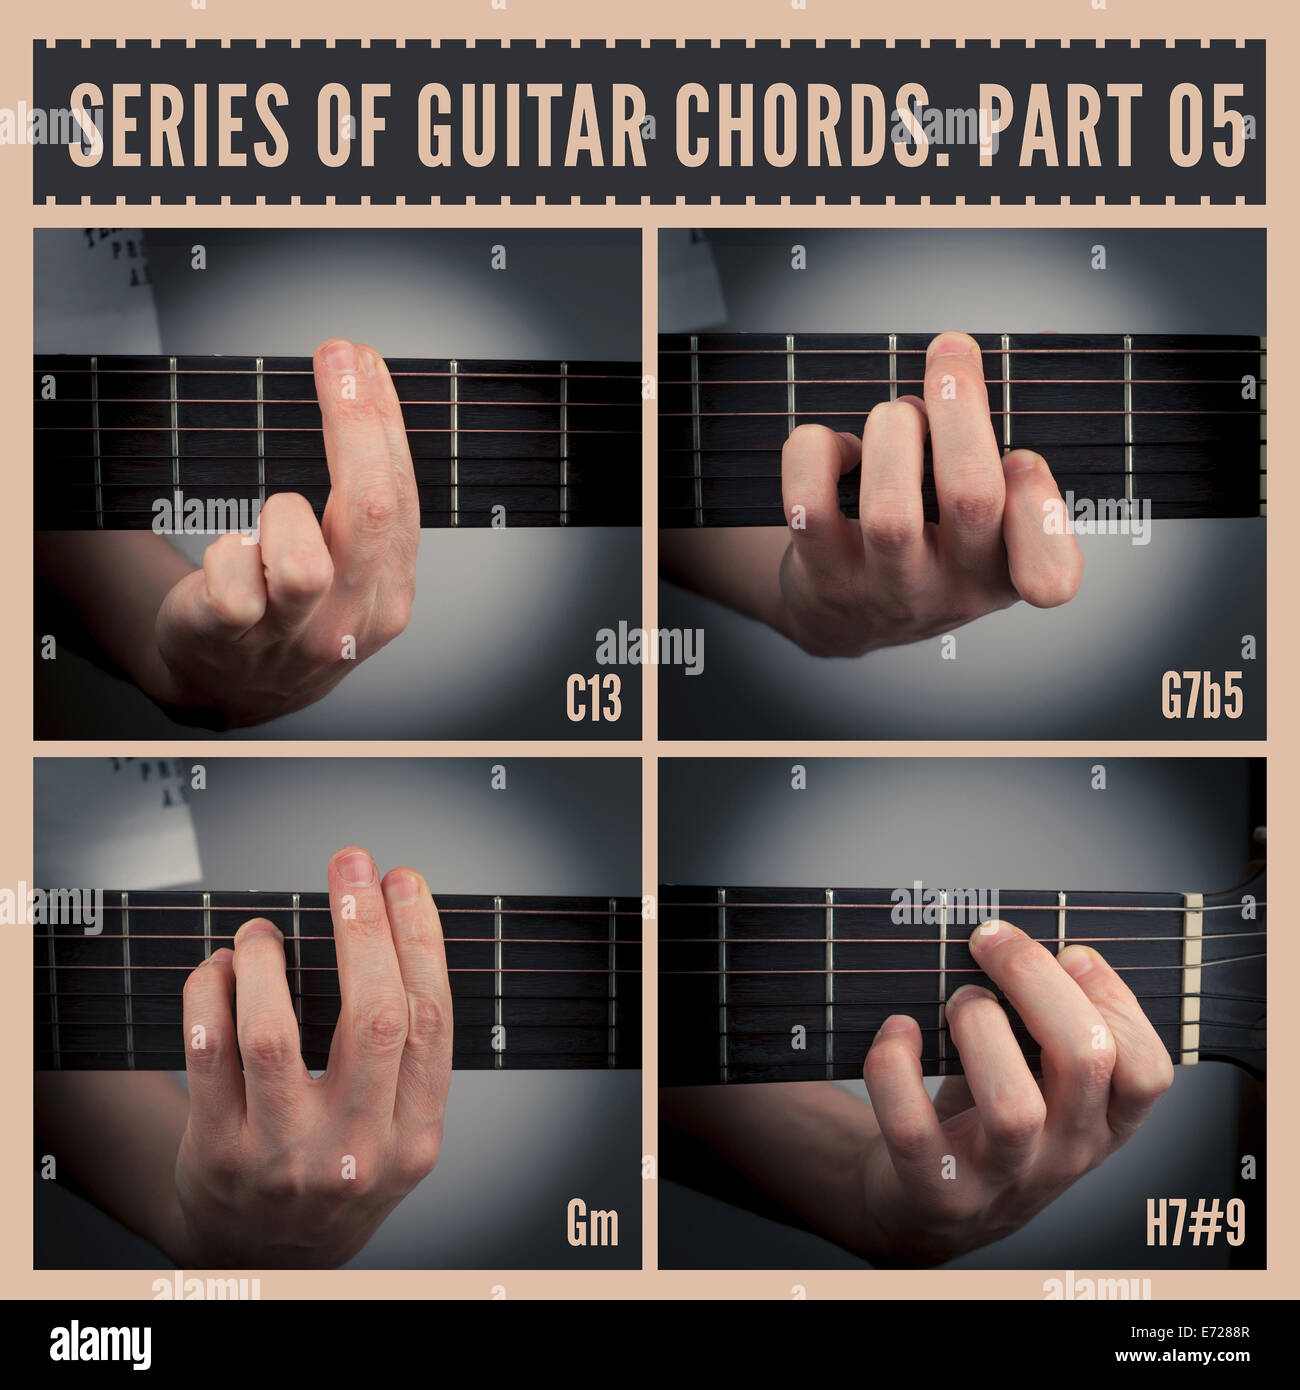 Guitar Chords Stock Photo Royalty Free Image 73194487 Alamy